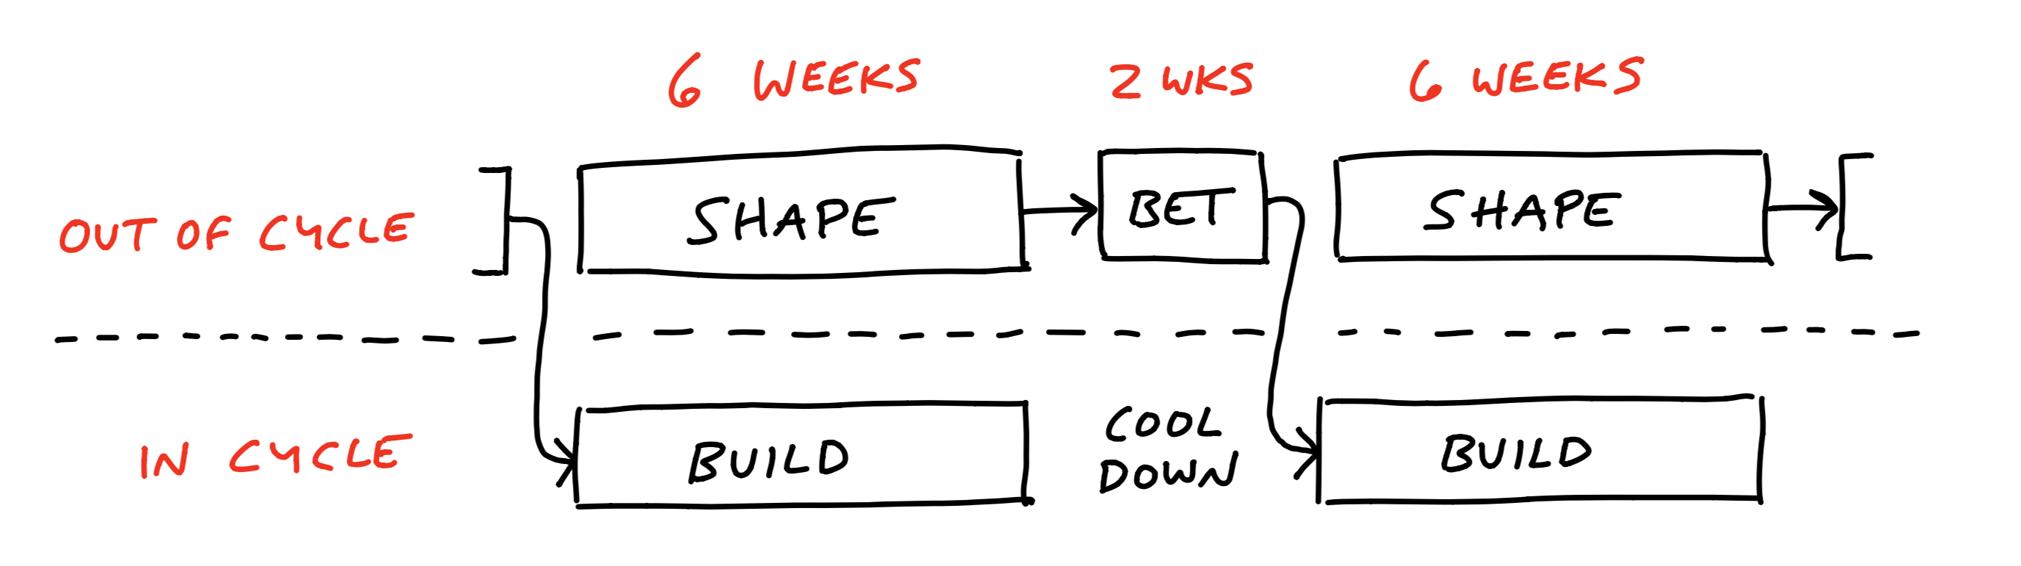 Basecamp Shape Up dual track process